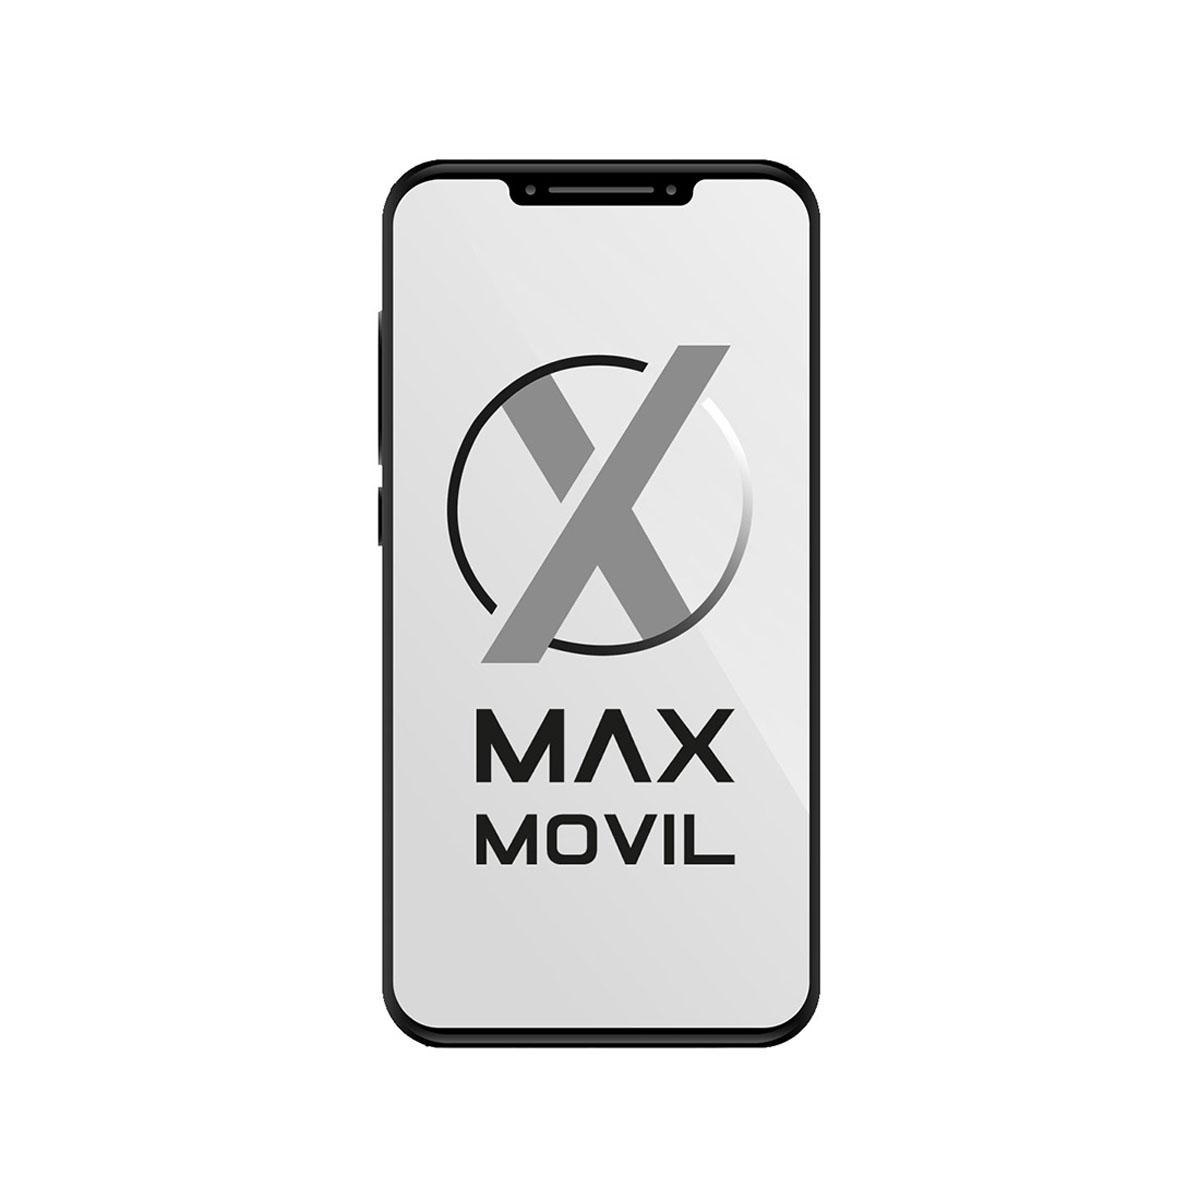 eda4859814f Funda flip cover original de Samsung EF-FA300BSEGWW para Galaxy A3 ·  MaxMovil ⓴⓳